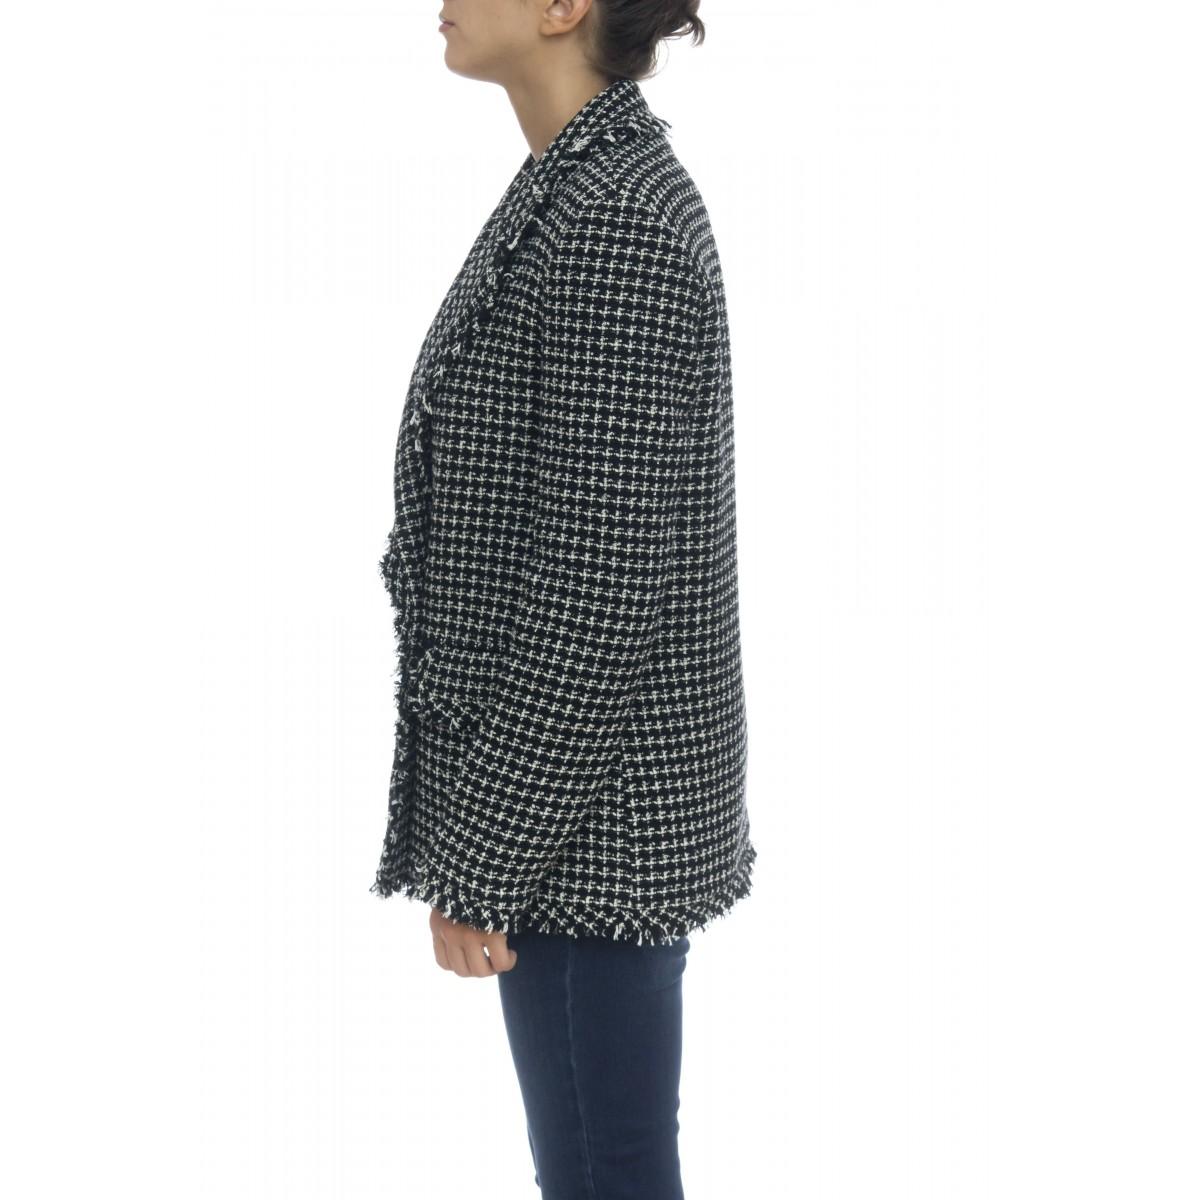 Giacca donna - Crowe giacca chanel